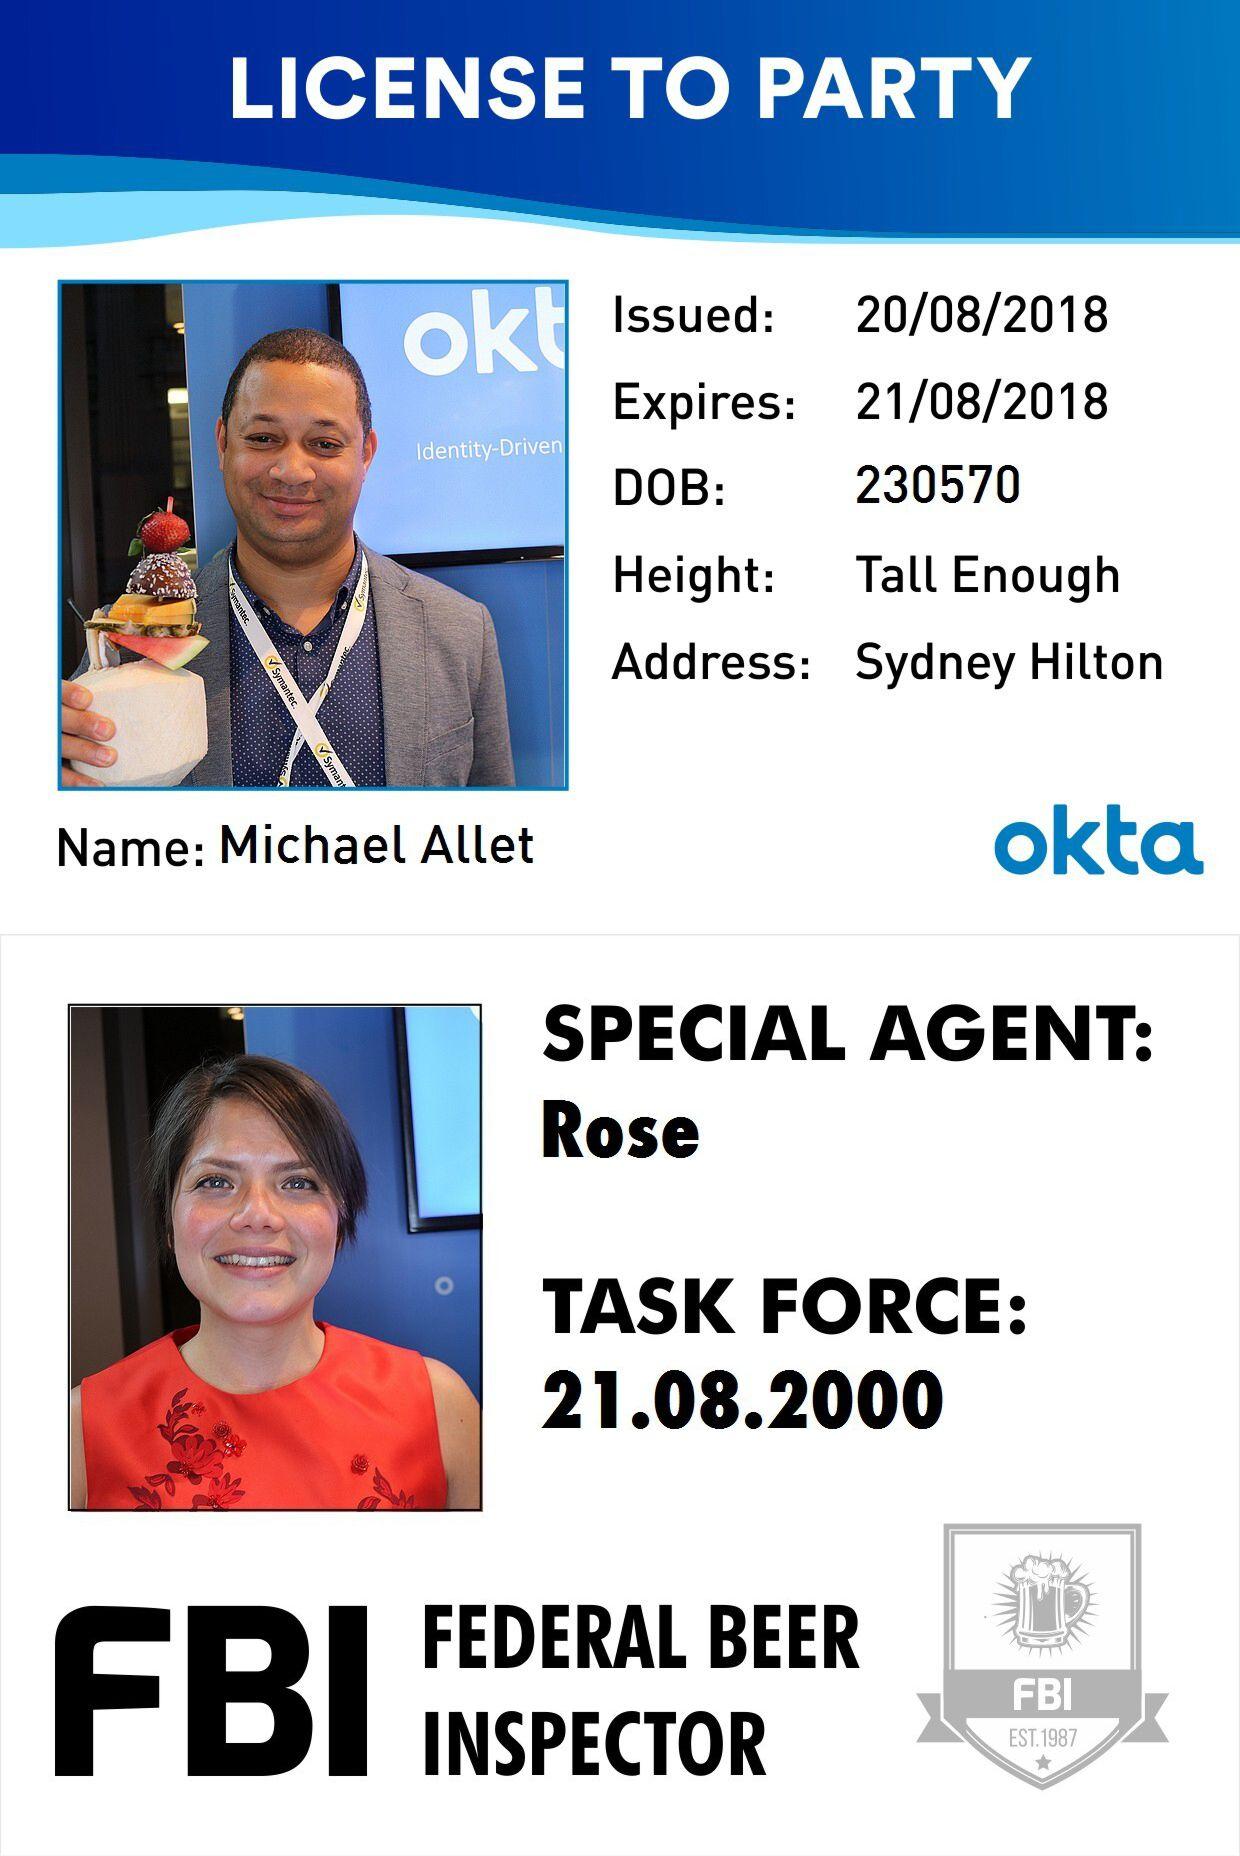 Okta Fake IDs